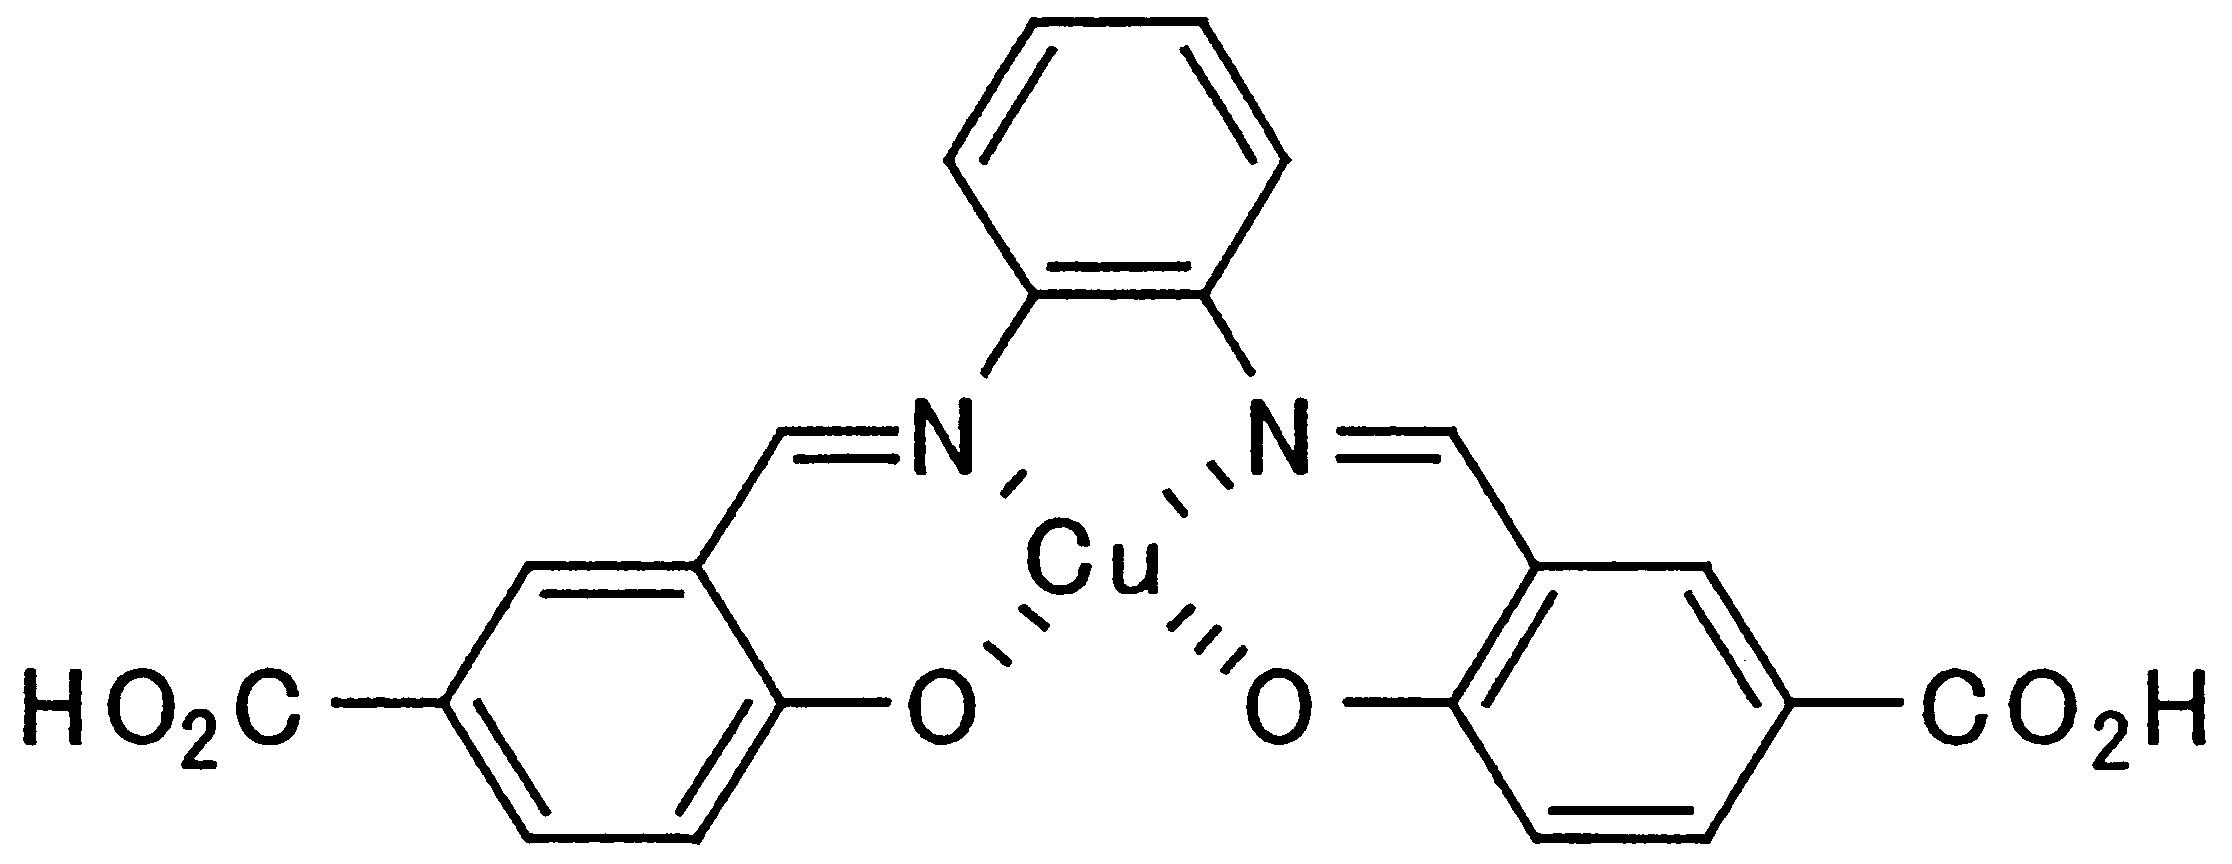 Figure 112003016236117-pat00018